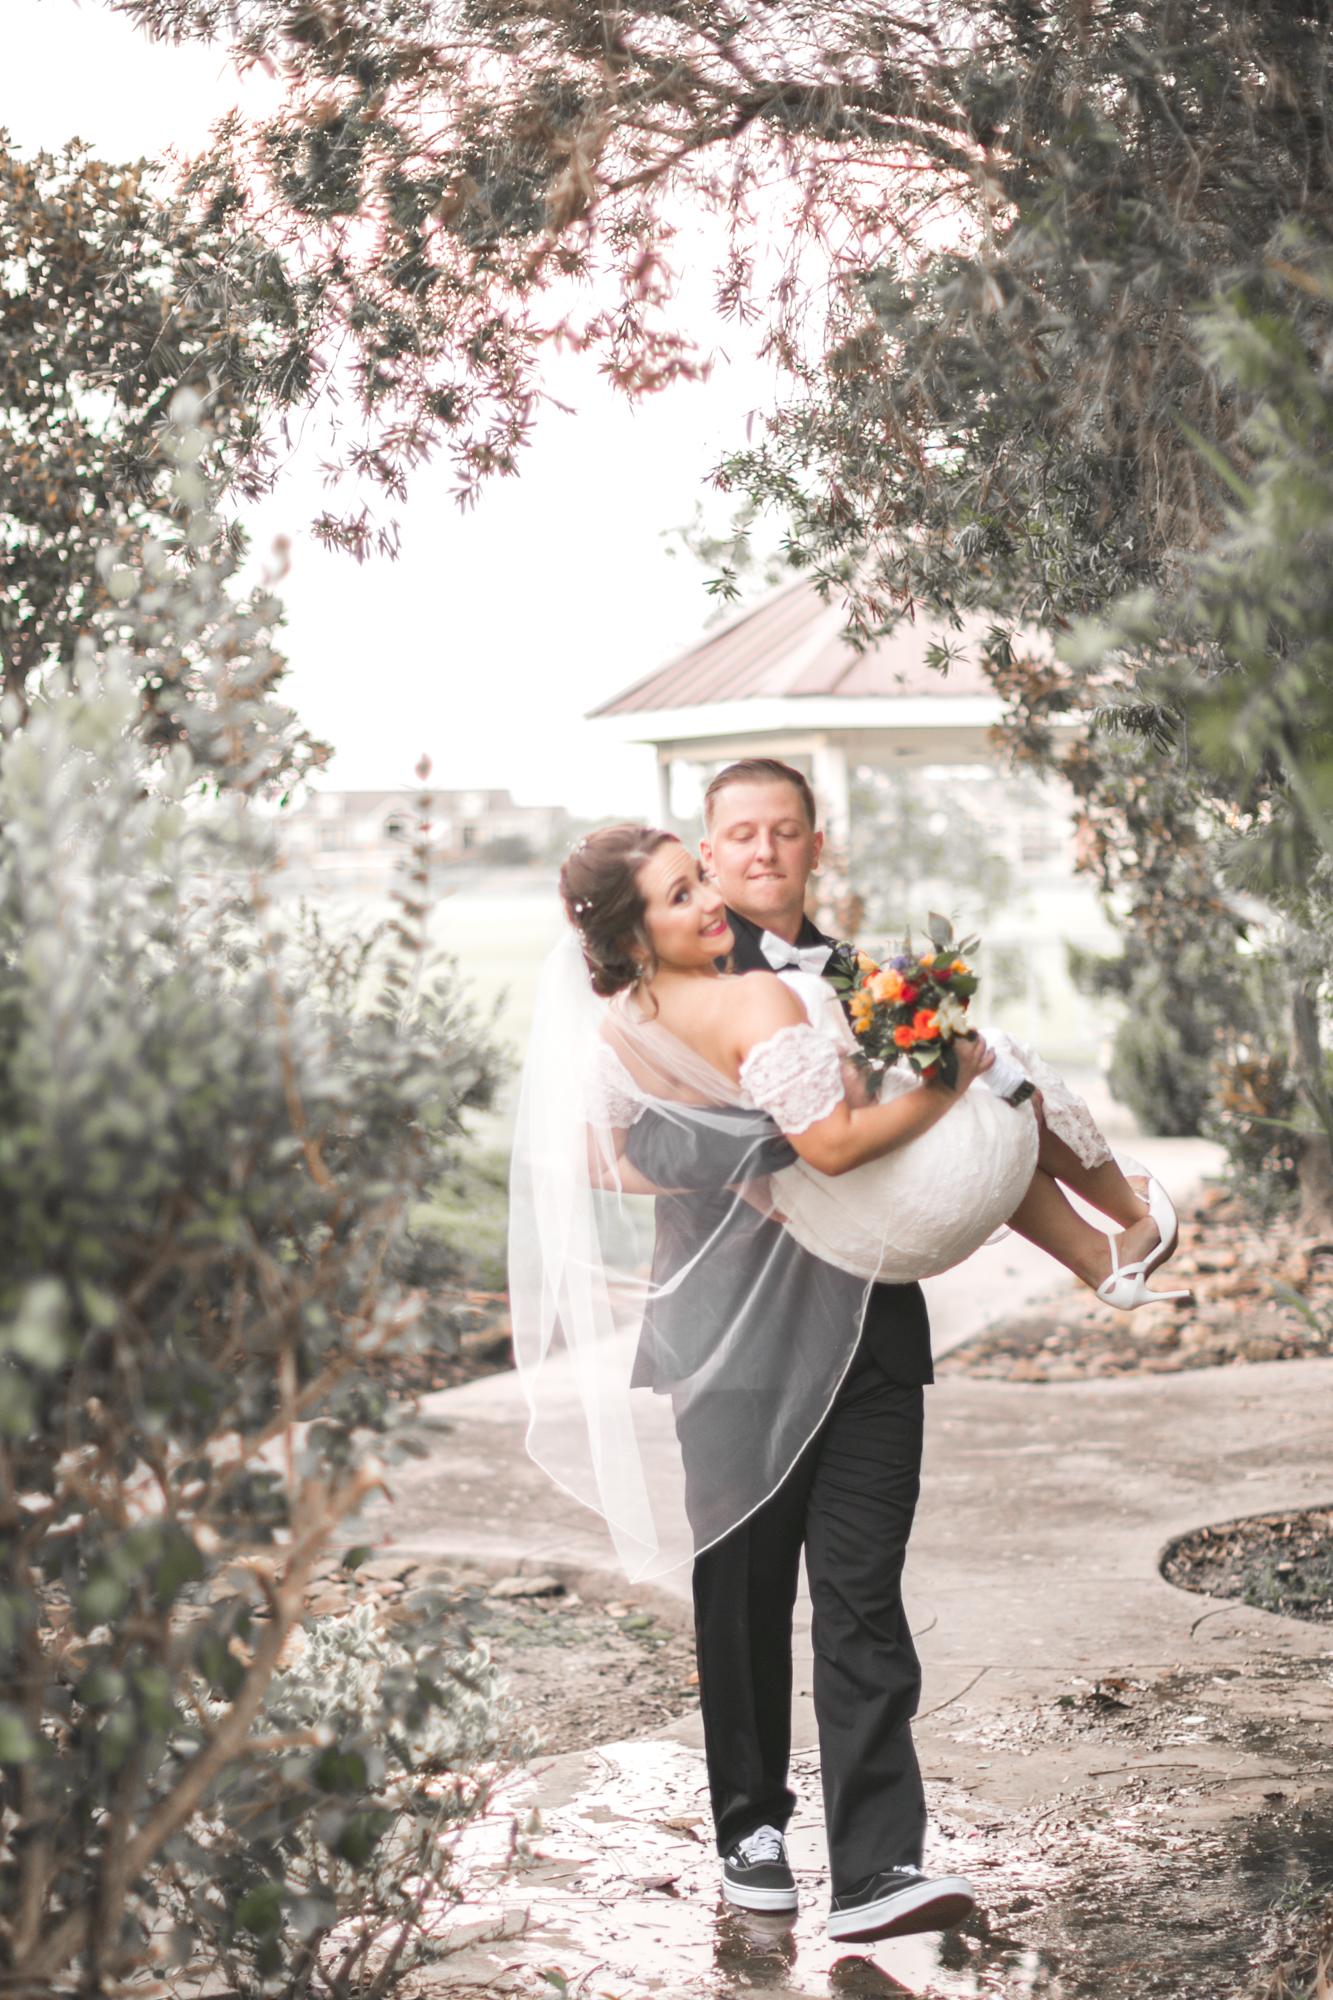 Seymour-Matte Wedding-38.jpg